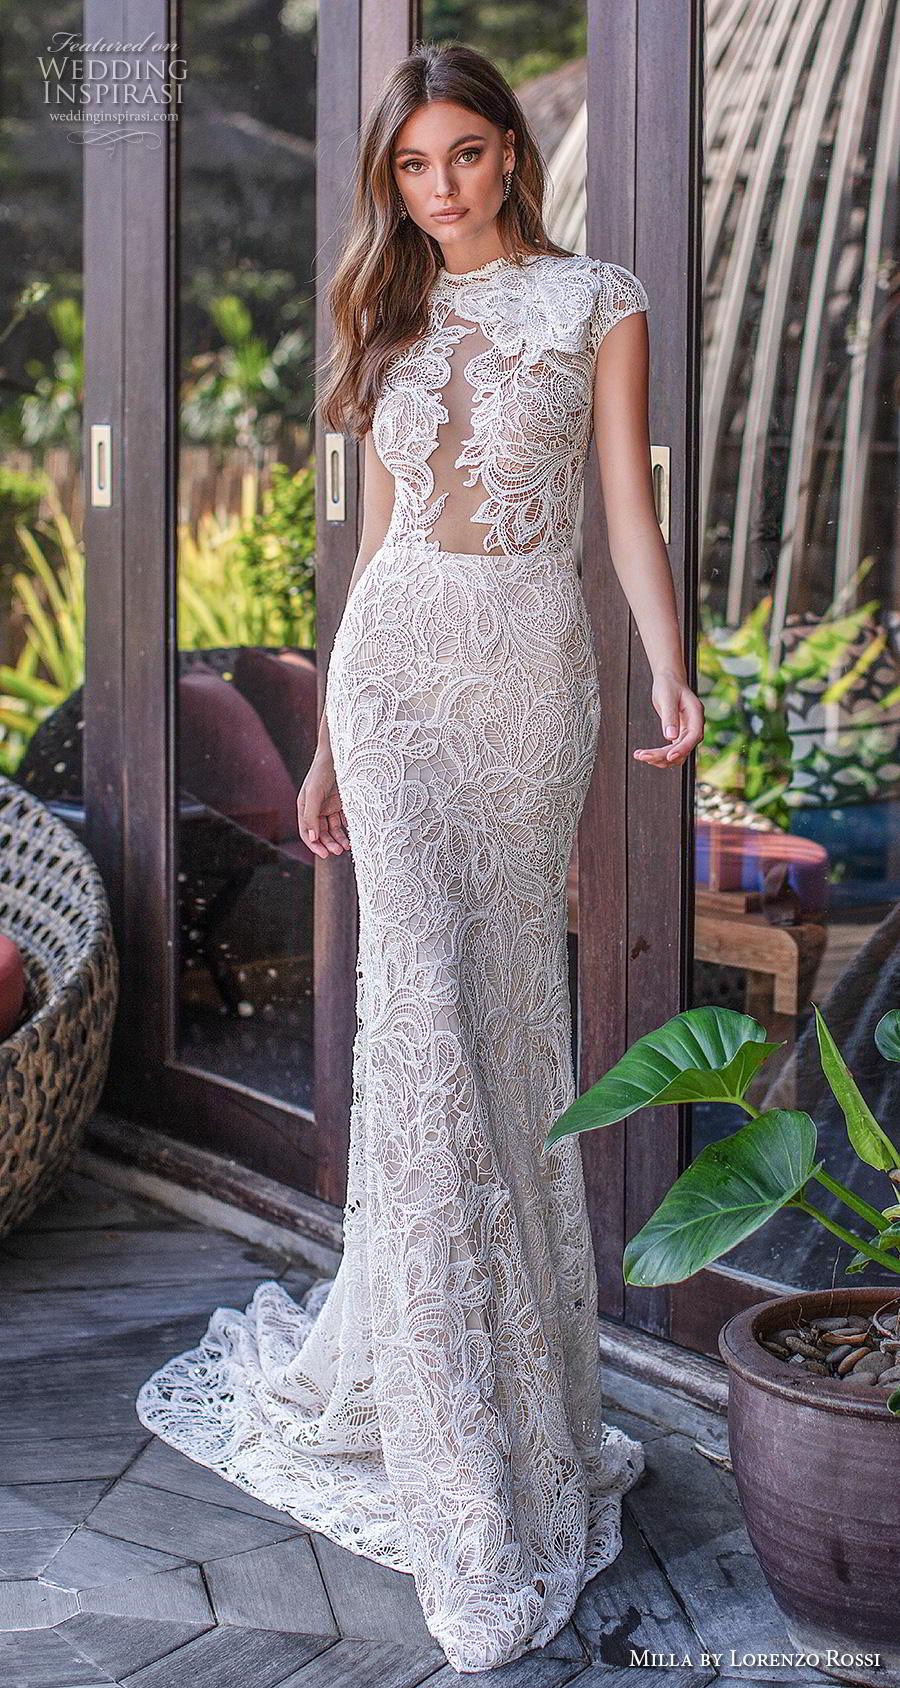 lorenzo rossi 2019 milla bridal cap sleeves jewel neck full embellishment elegant fit and flare sheath wedding dress keyhole back short train (12) mv